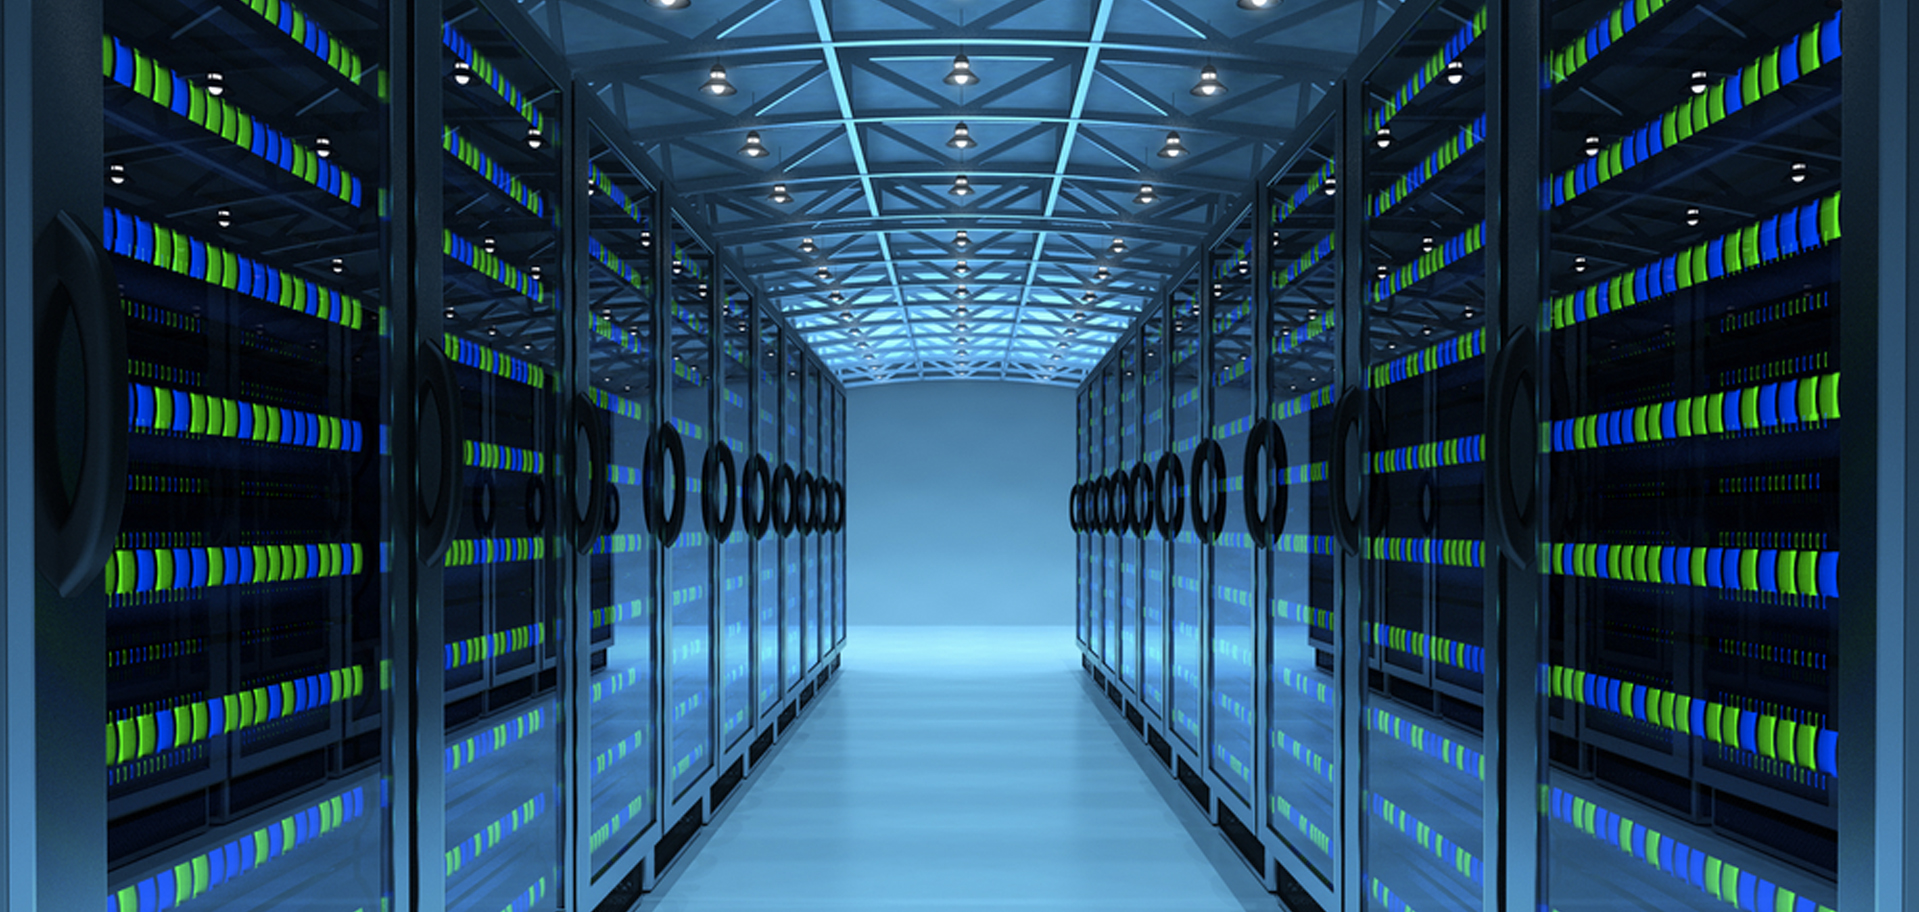 datacenter-gettyimage